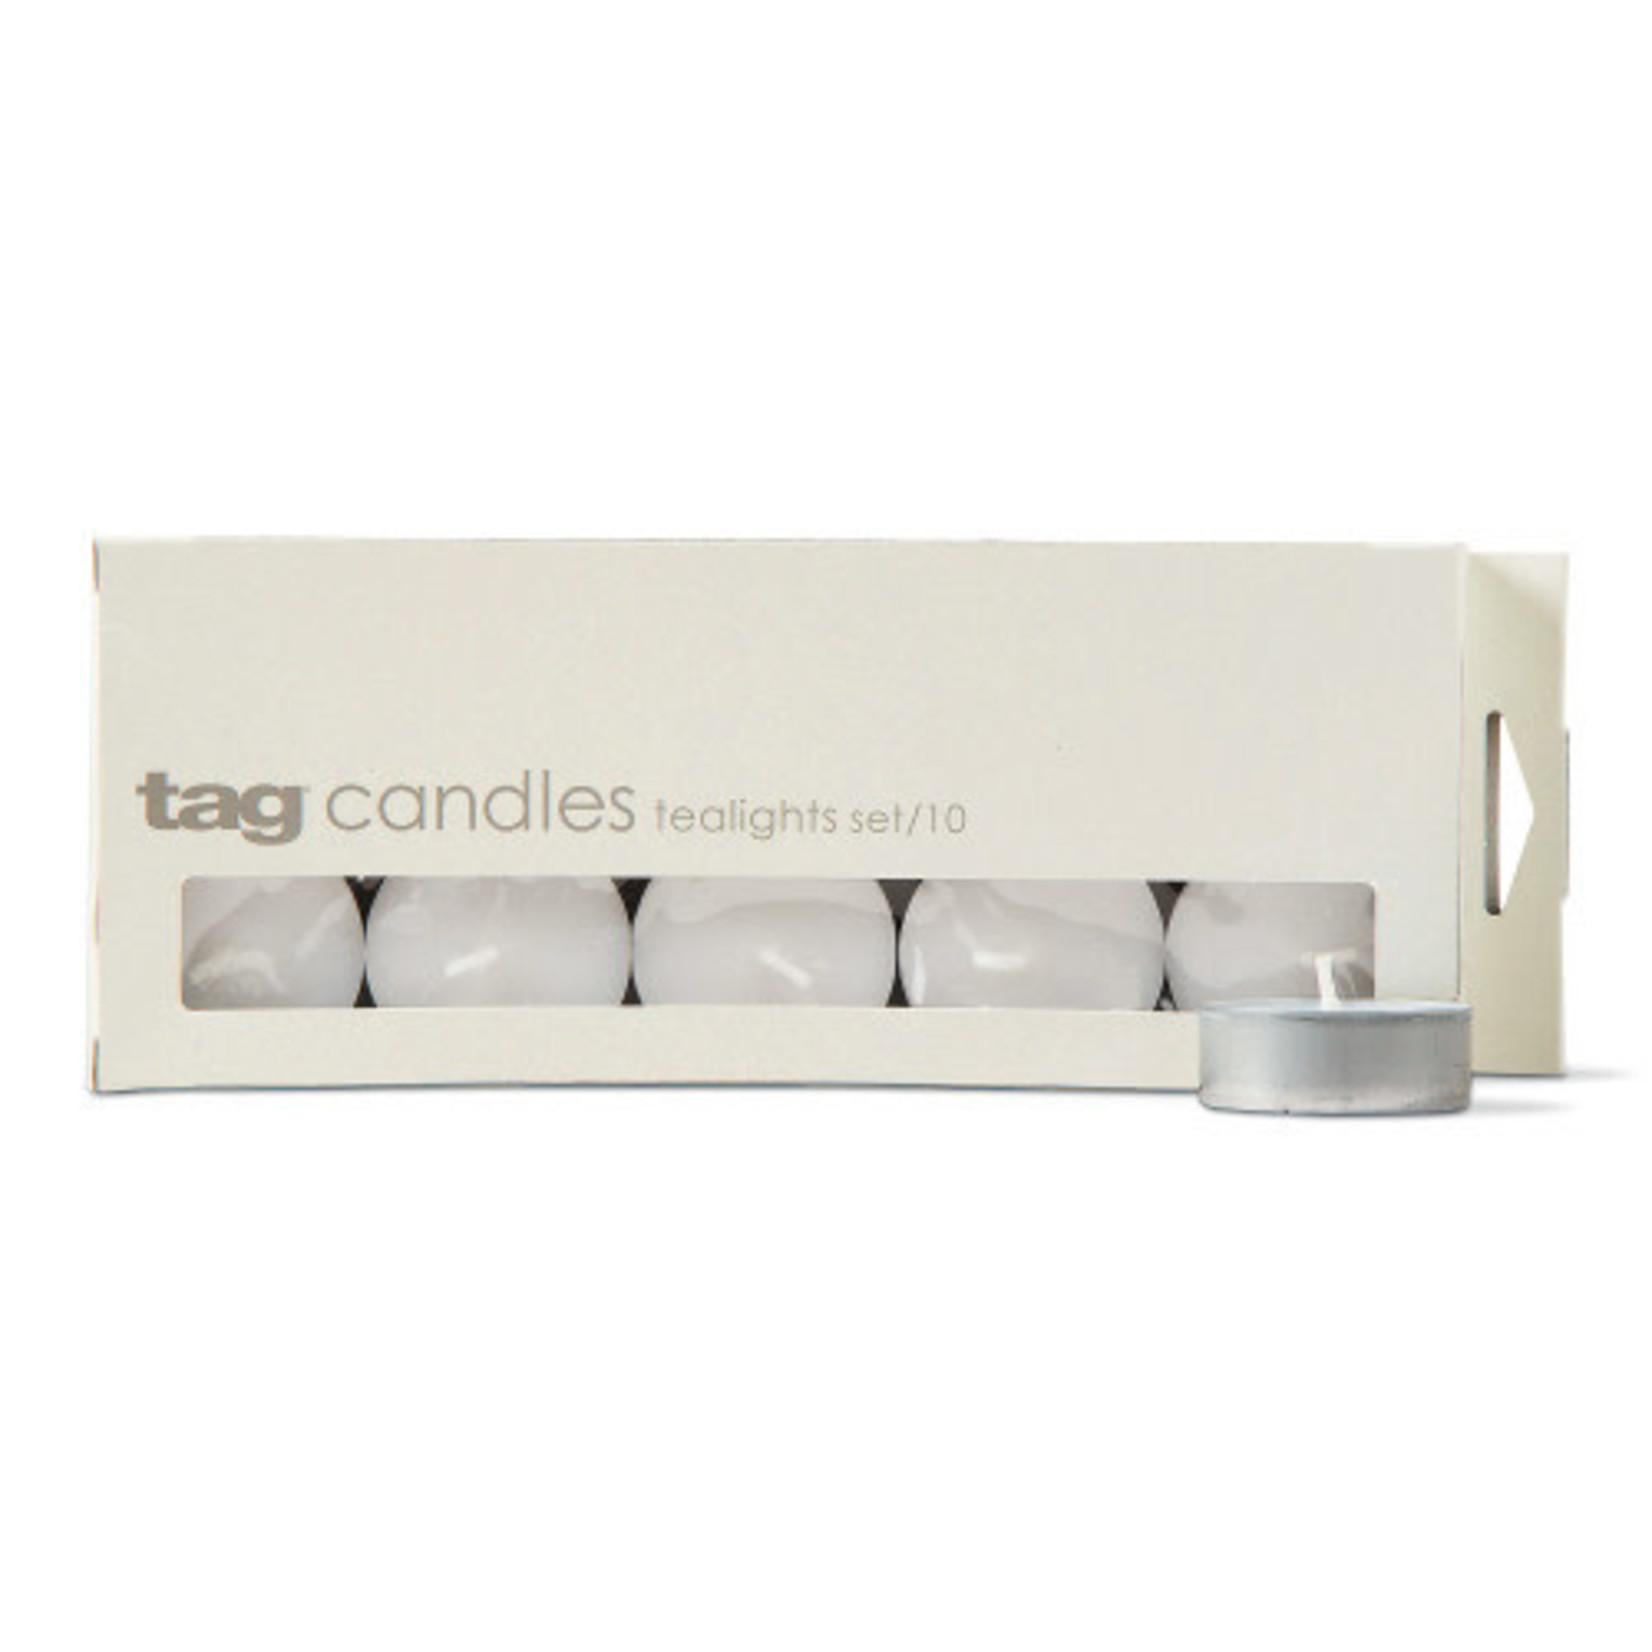 Basic Tealight Candles Set of 10 White